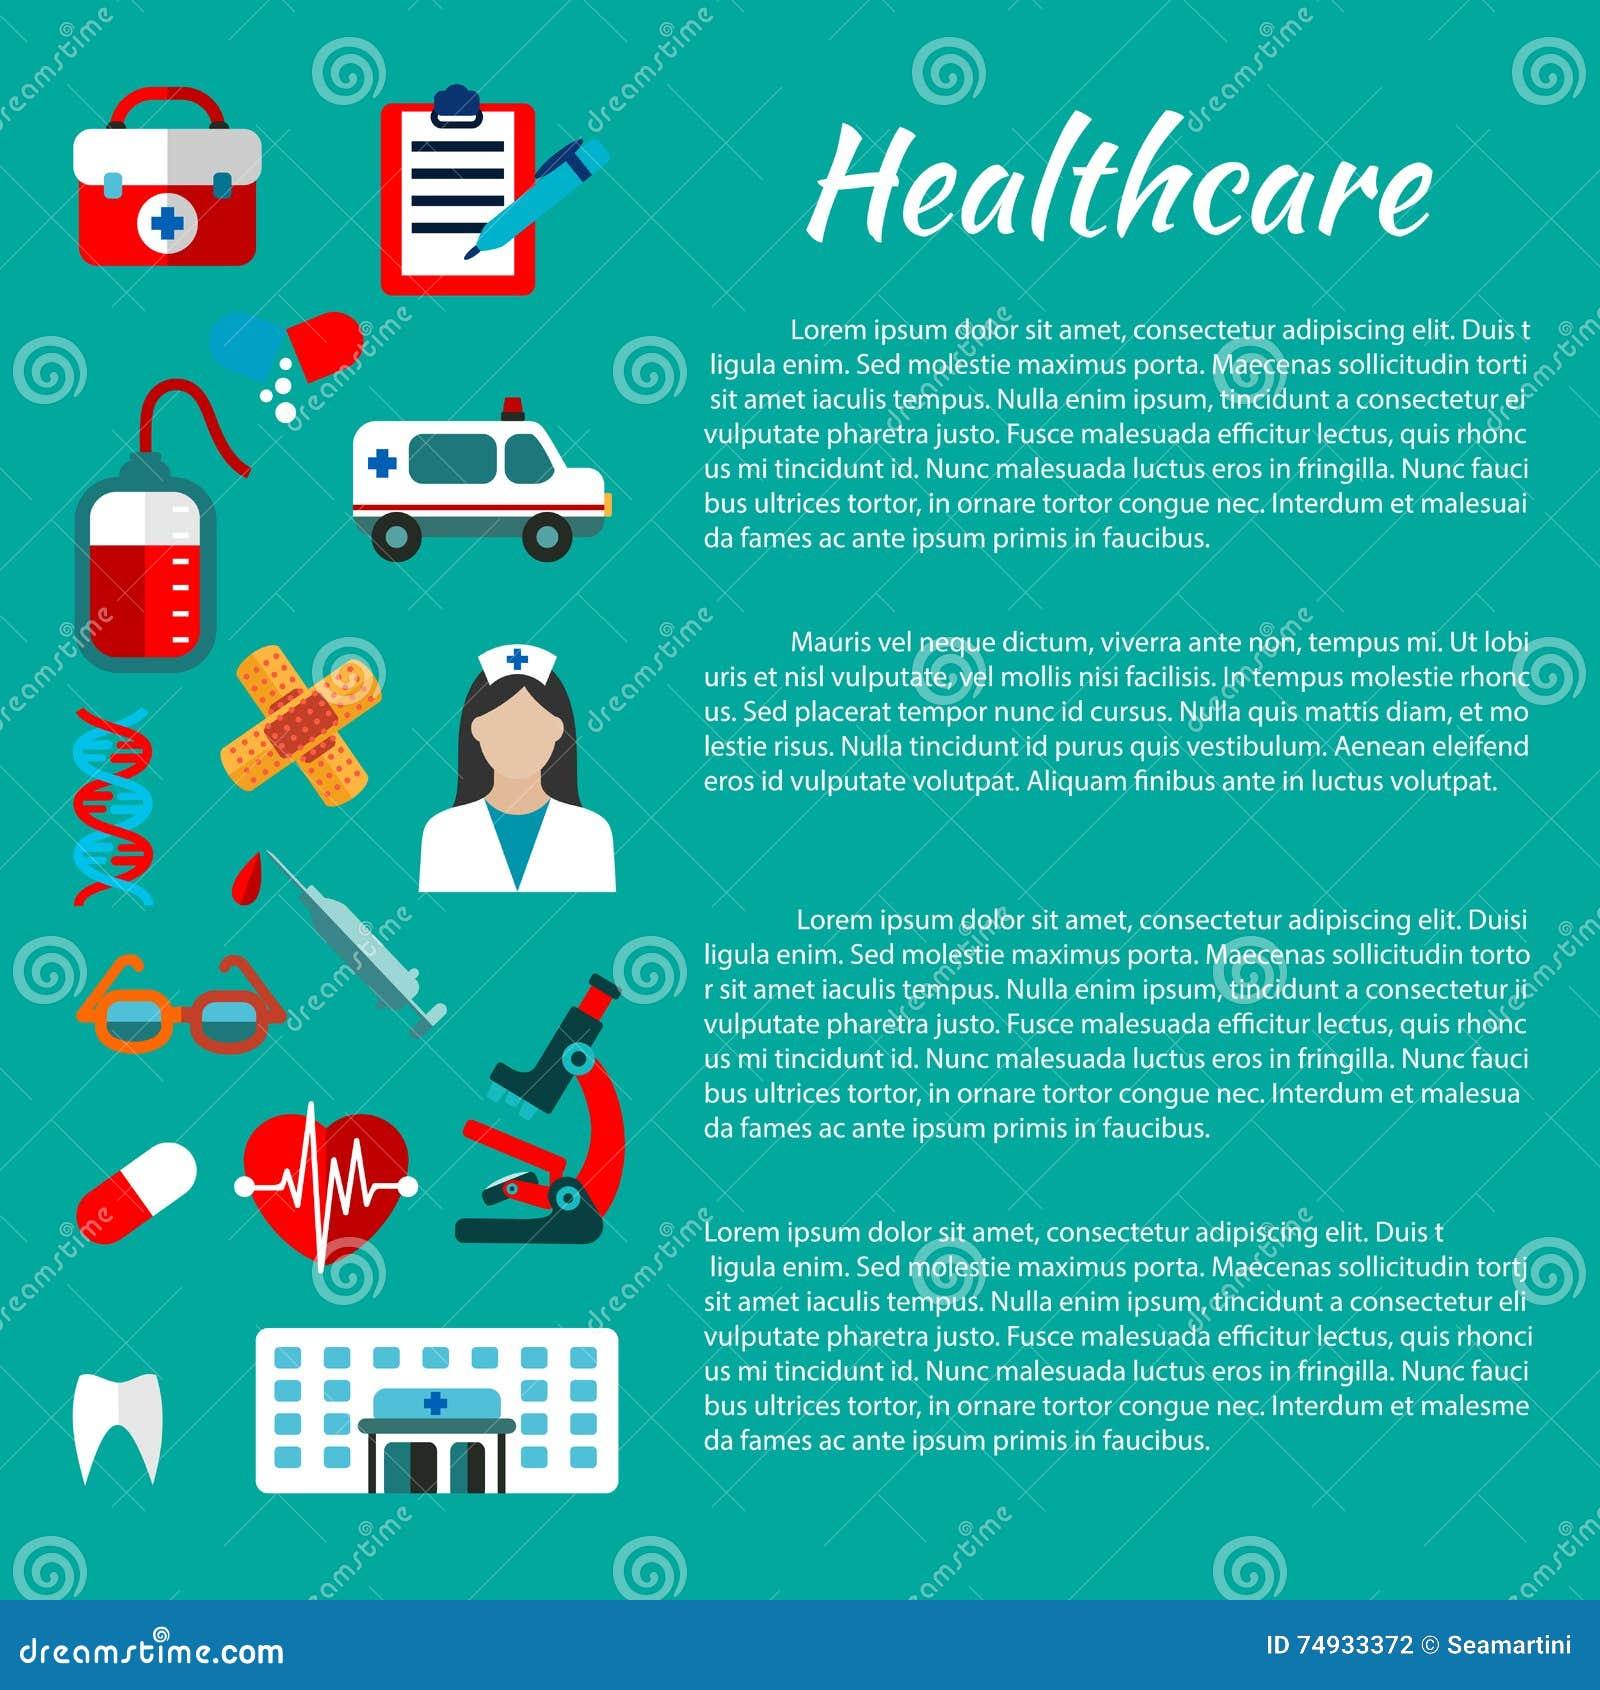 Poster design medical - Poster Design Medical Healthcare And Medical Poster Design